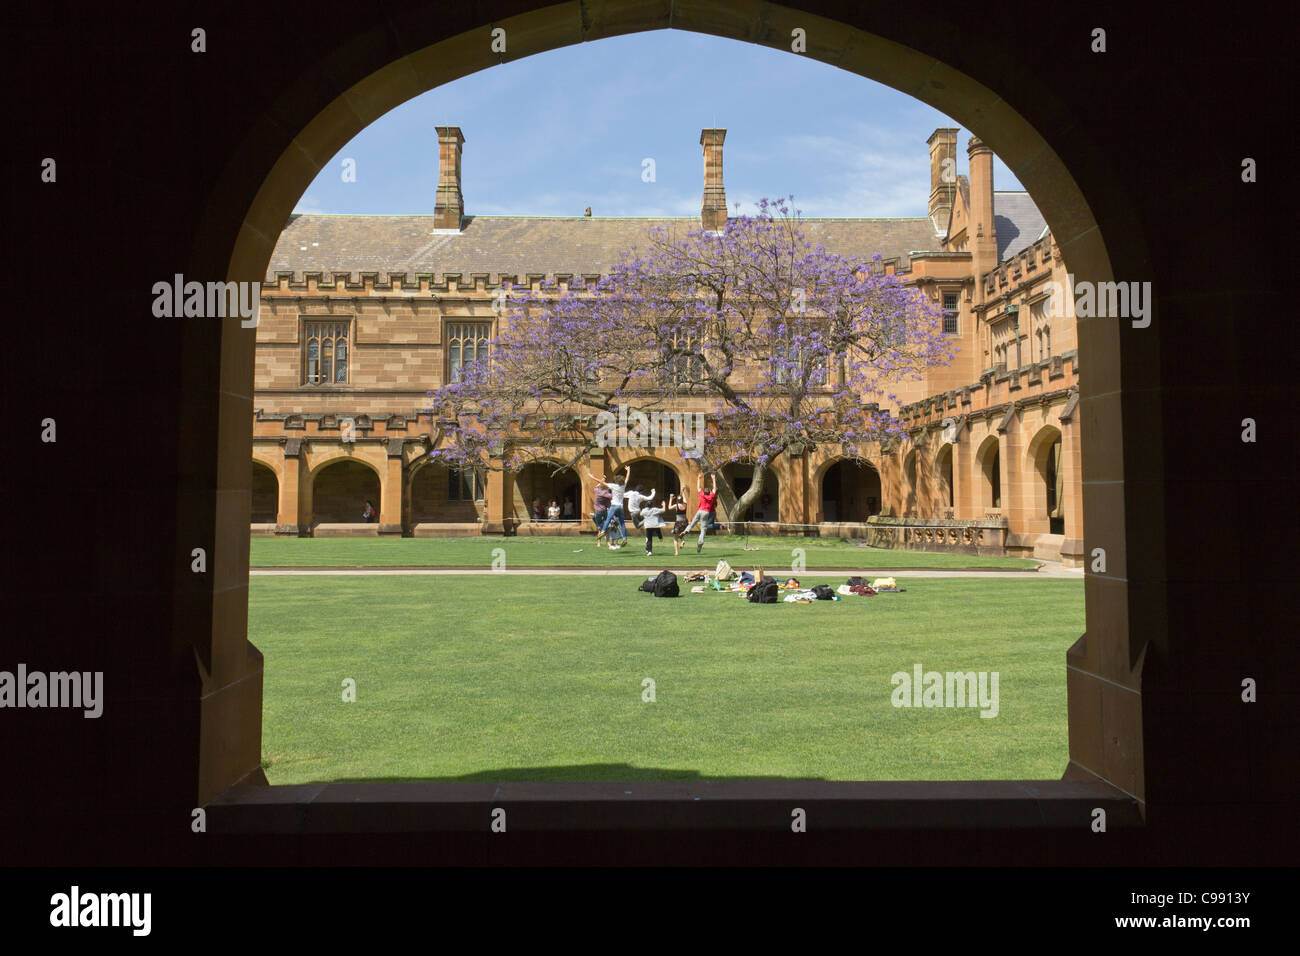 University of Sydney main quadrangle, Sydney, Australia - Stock Image